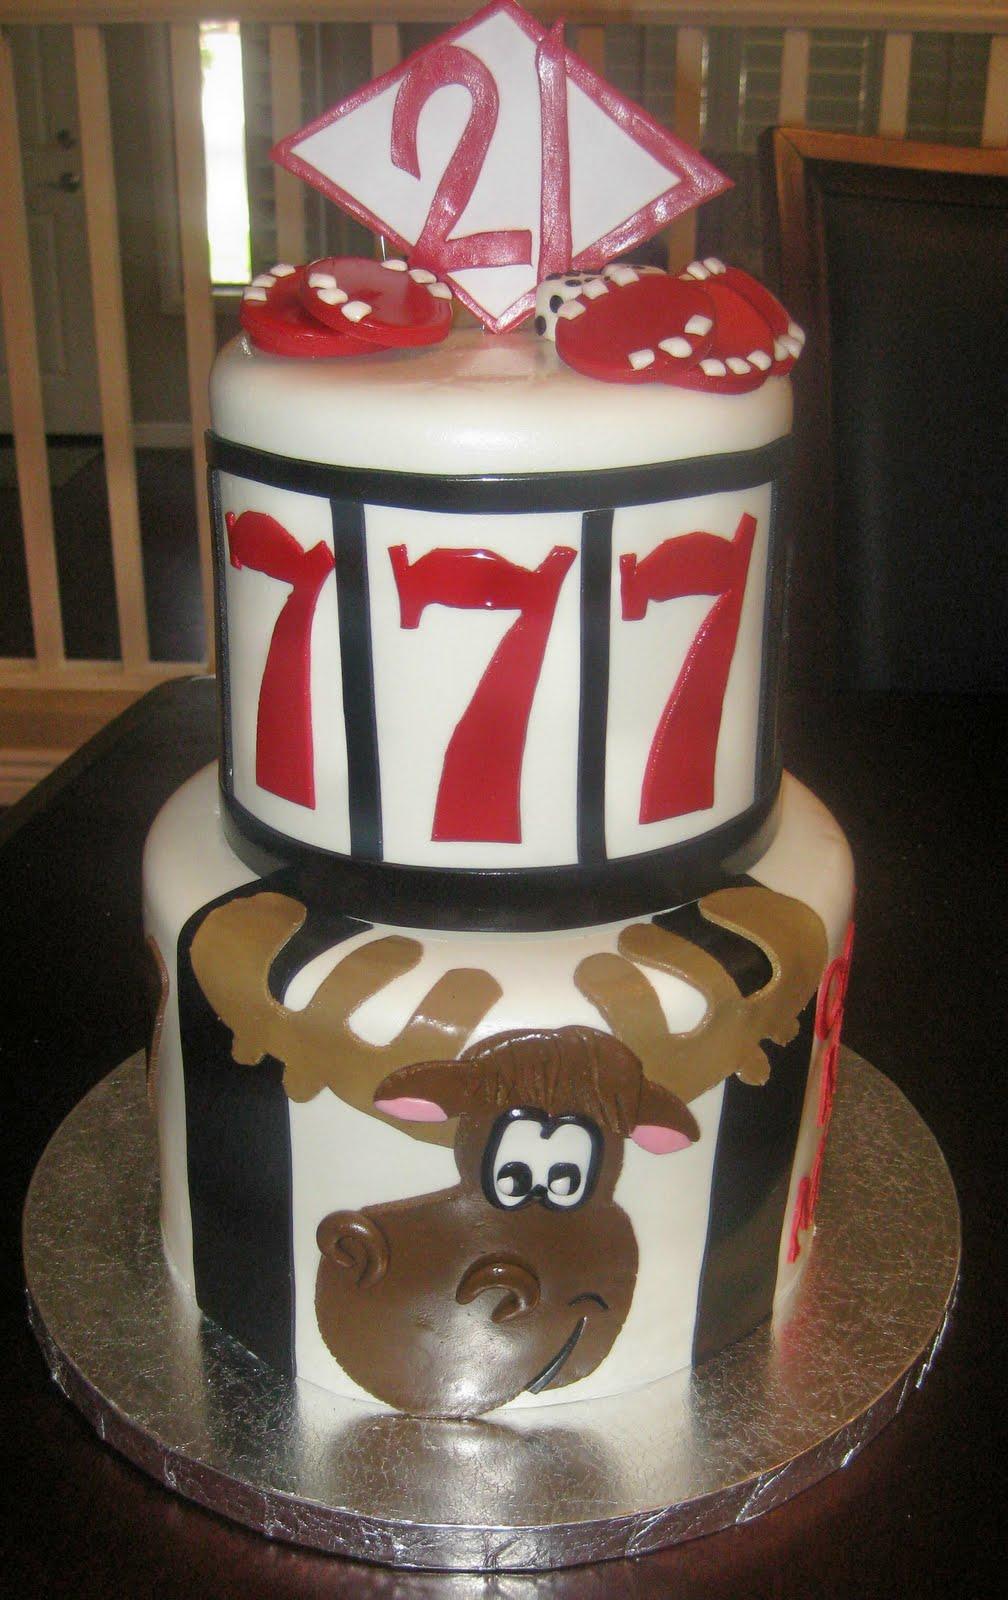 Sassy Cakes Your Fondant Cake Design Destination 21st Birthday Cake